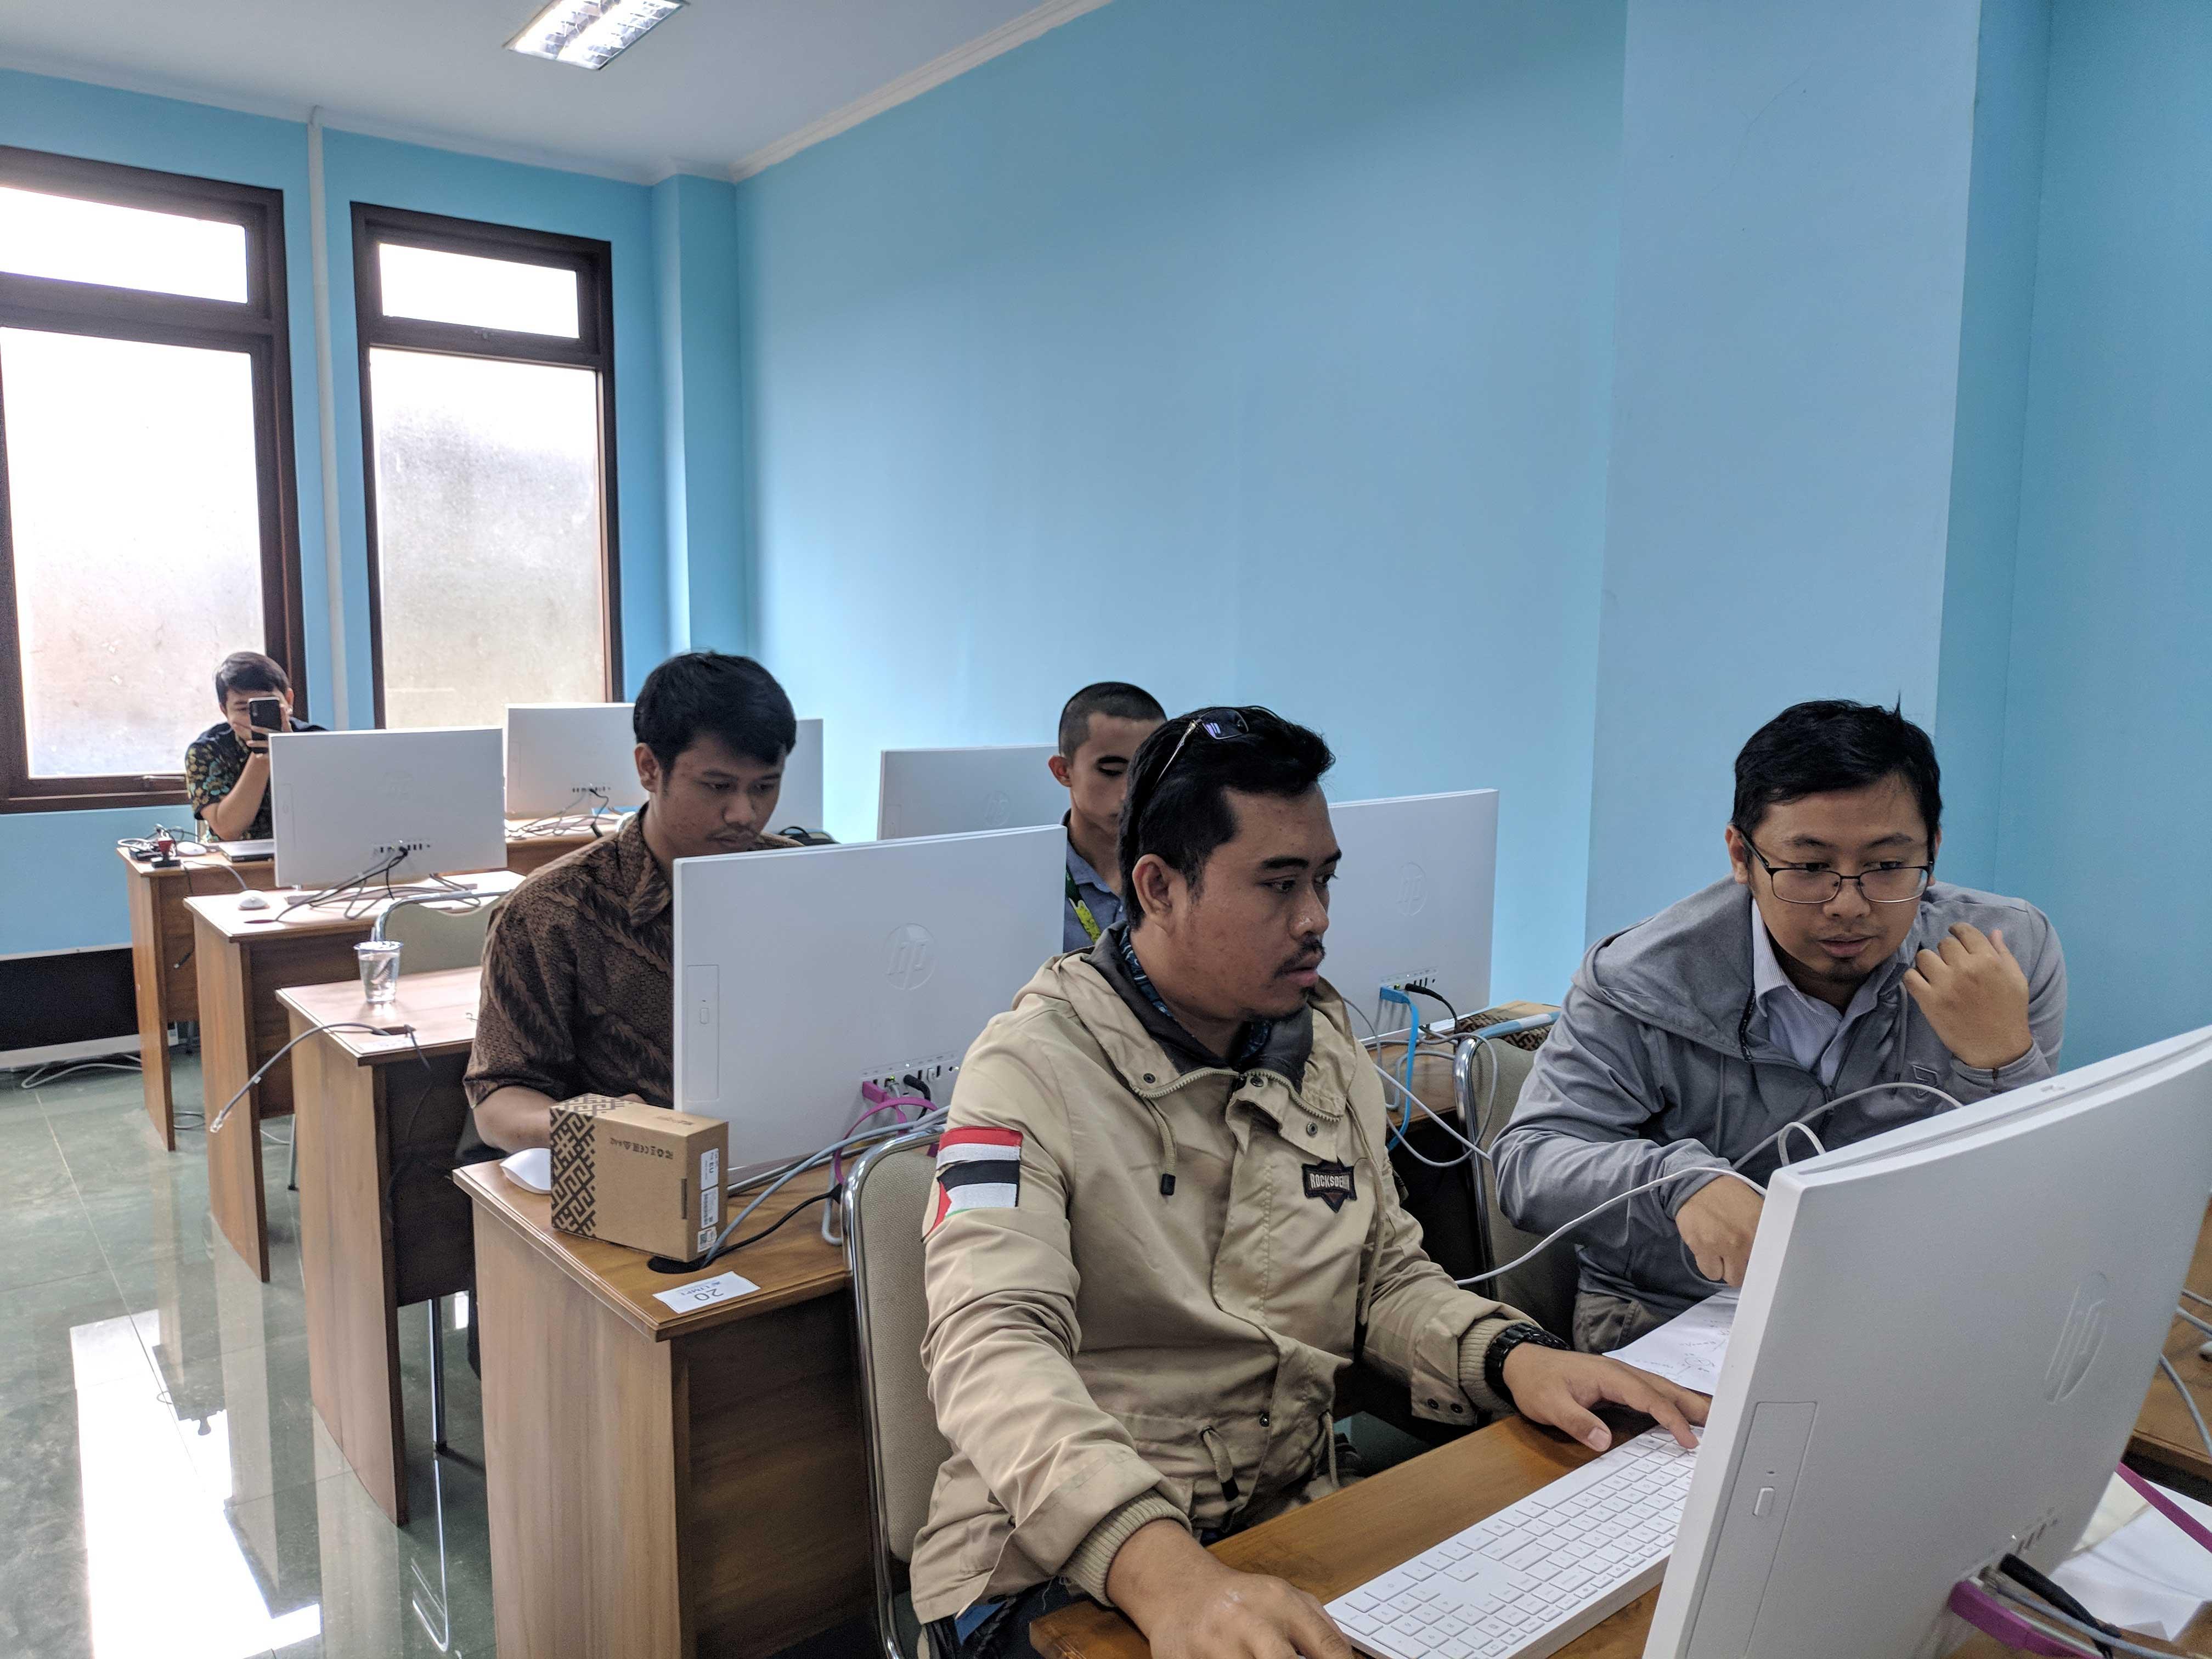 mikrotik training